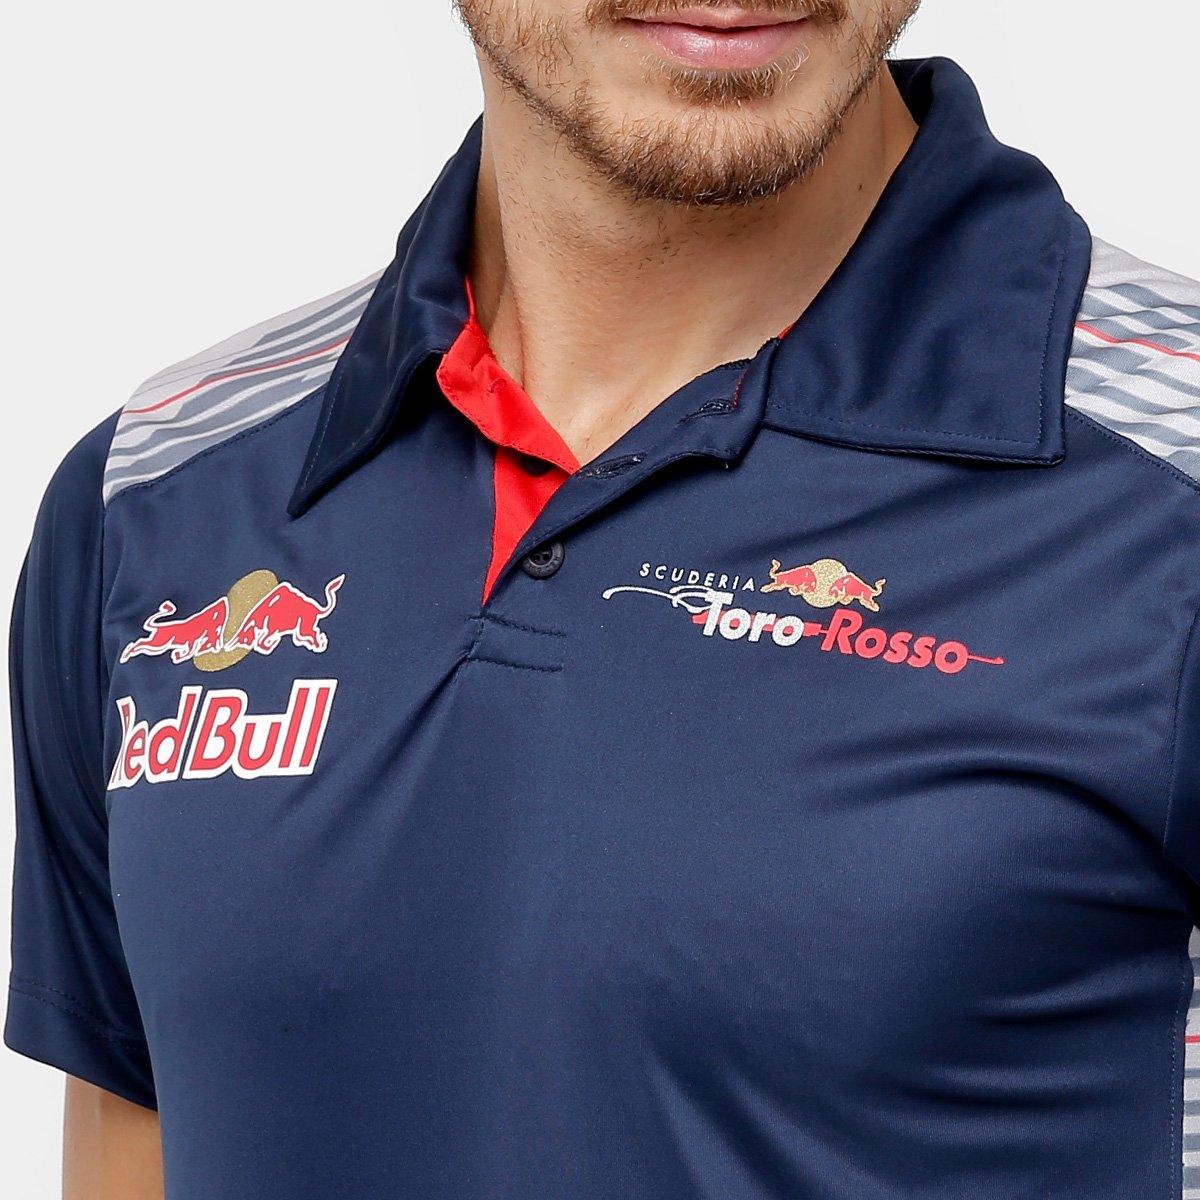 65f089ba80 Camisa Polo Red Bull Funcional Toro Rosso OTL Masculina - Compre ...